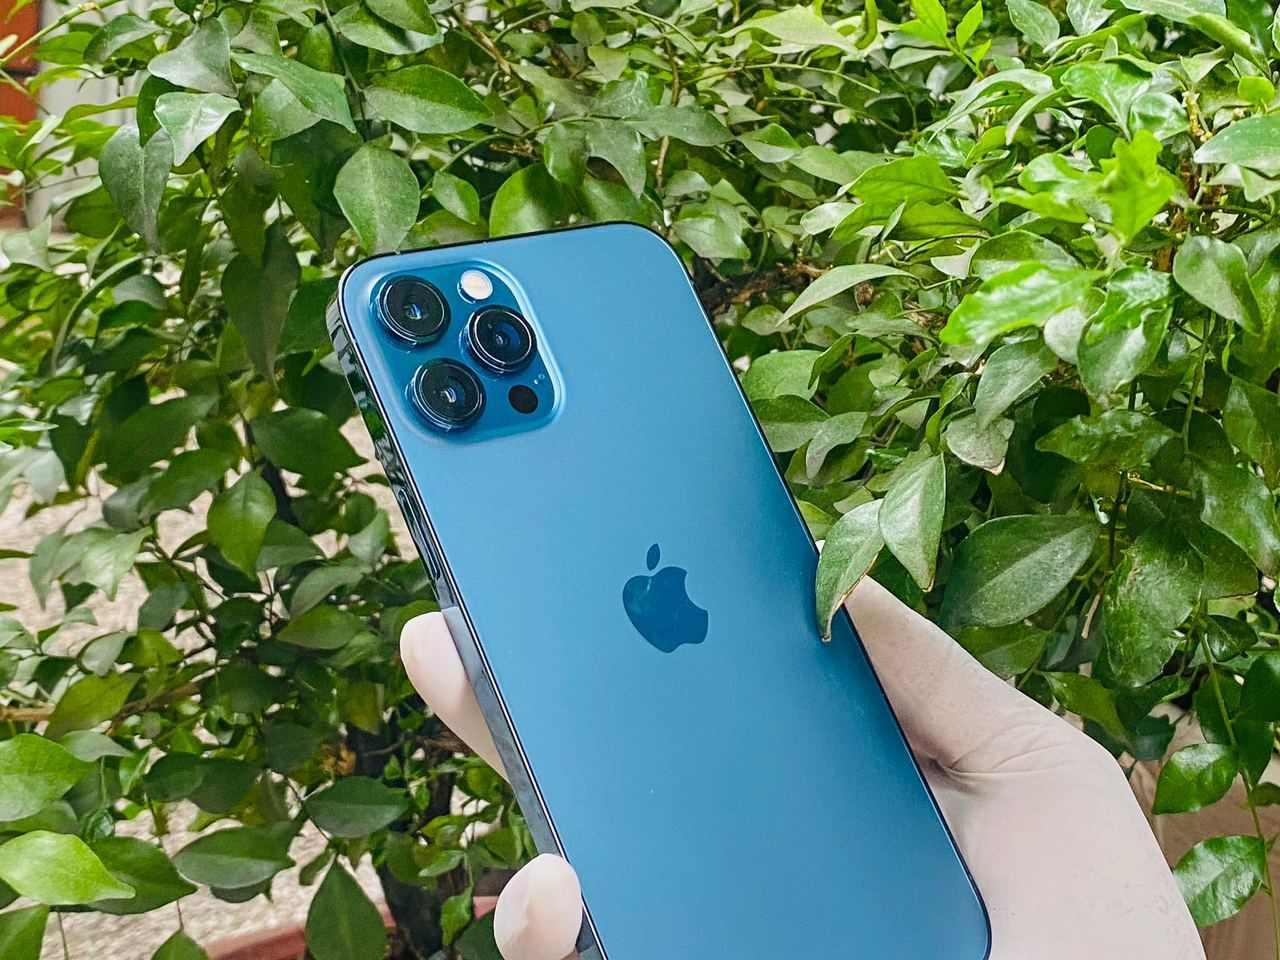 cau-hinh-iphone-12-pro-max